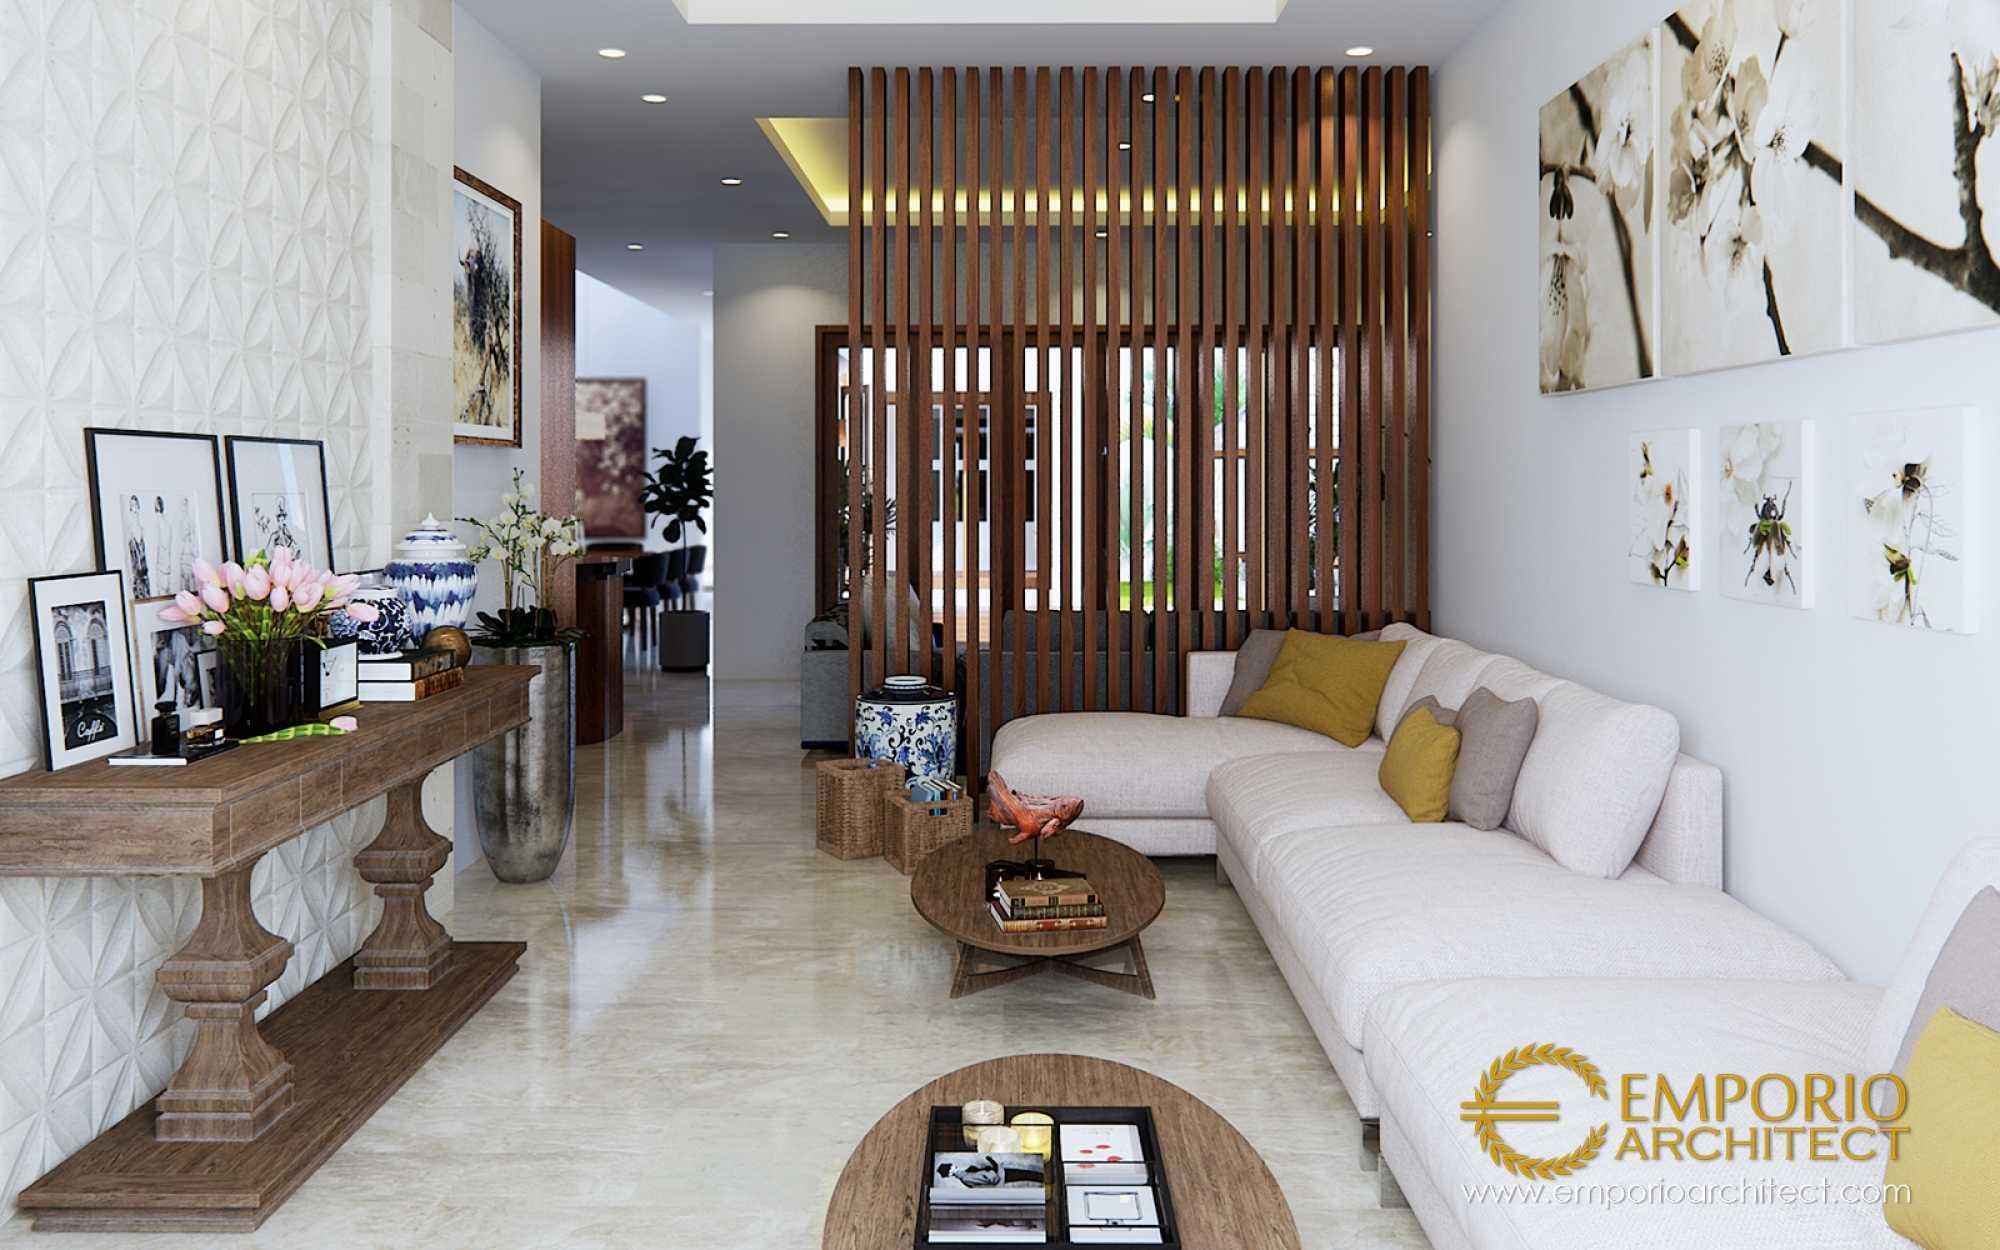 Emporio Architect Desain Rumah Villa Bali Tropis 381 @ Jawa Tengah Jawa Tengah, Indonesia Jawa Tengah, Indonesia Emporio-Architect-Desain-Rumah-Villa-Bali-Tropis-381-Jawa-Tengah   76577